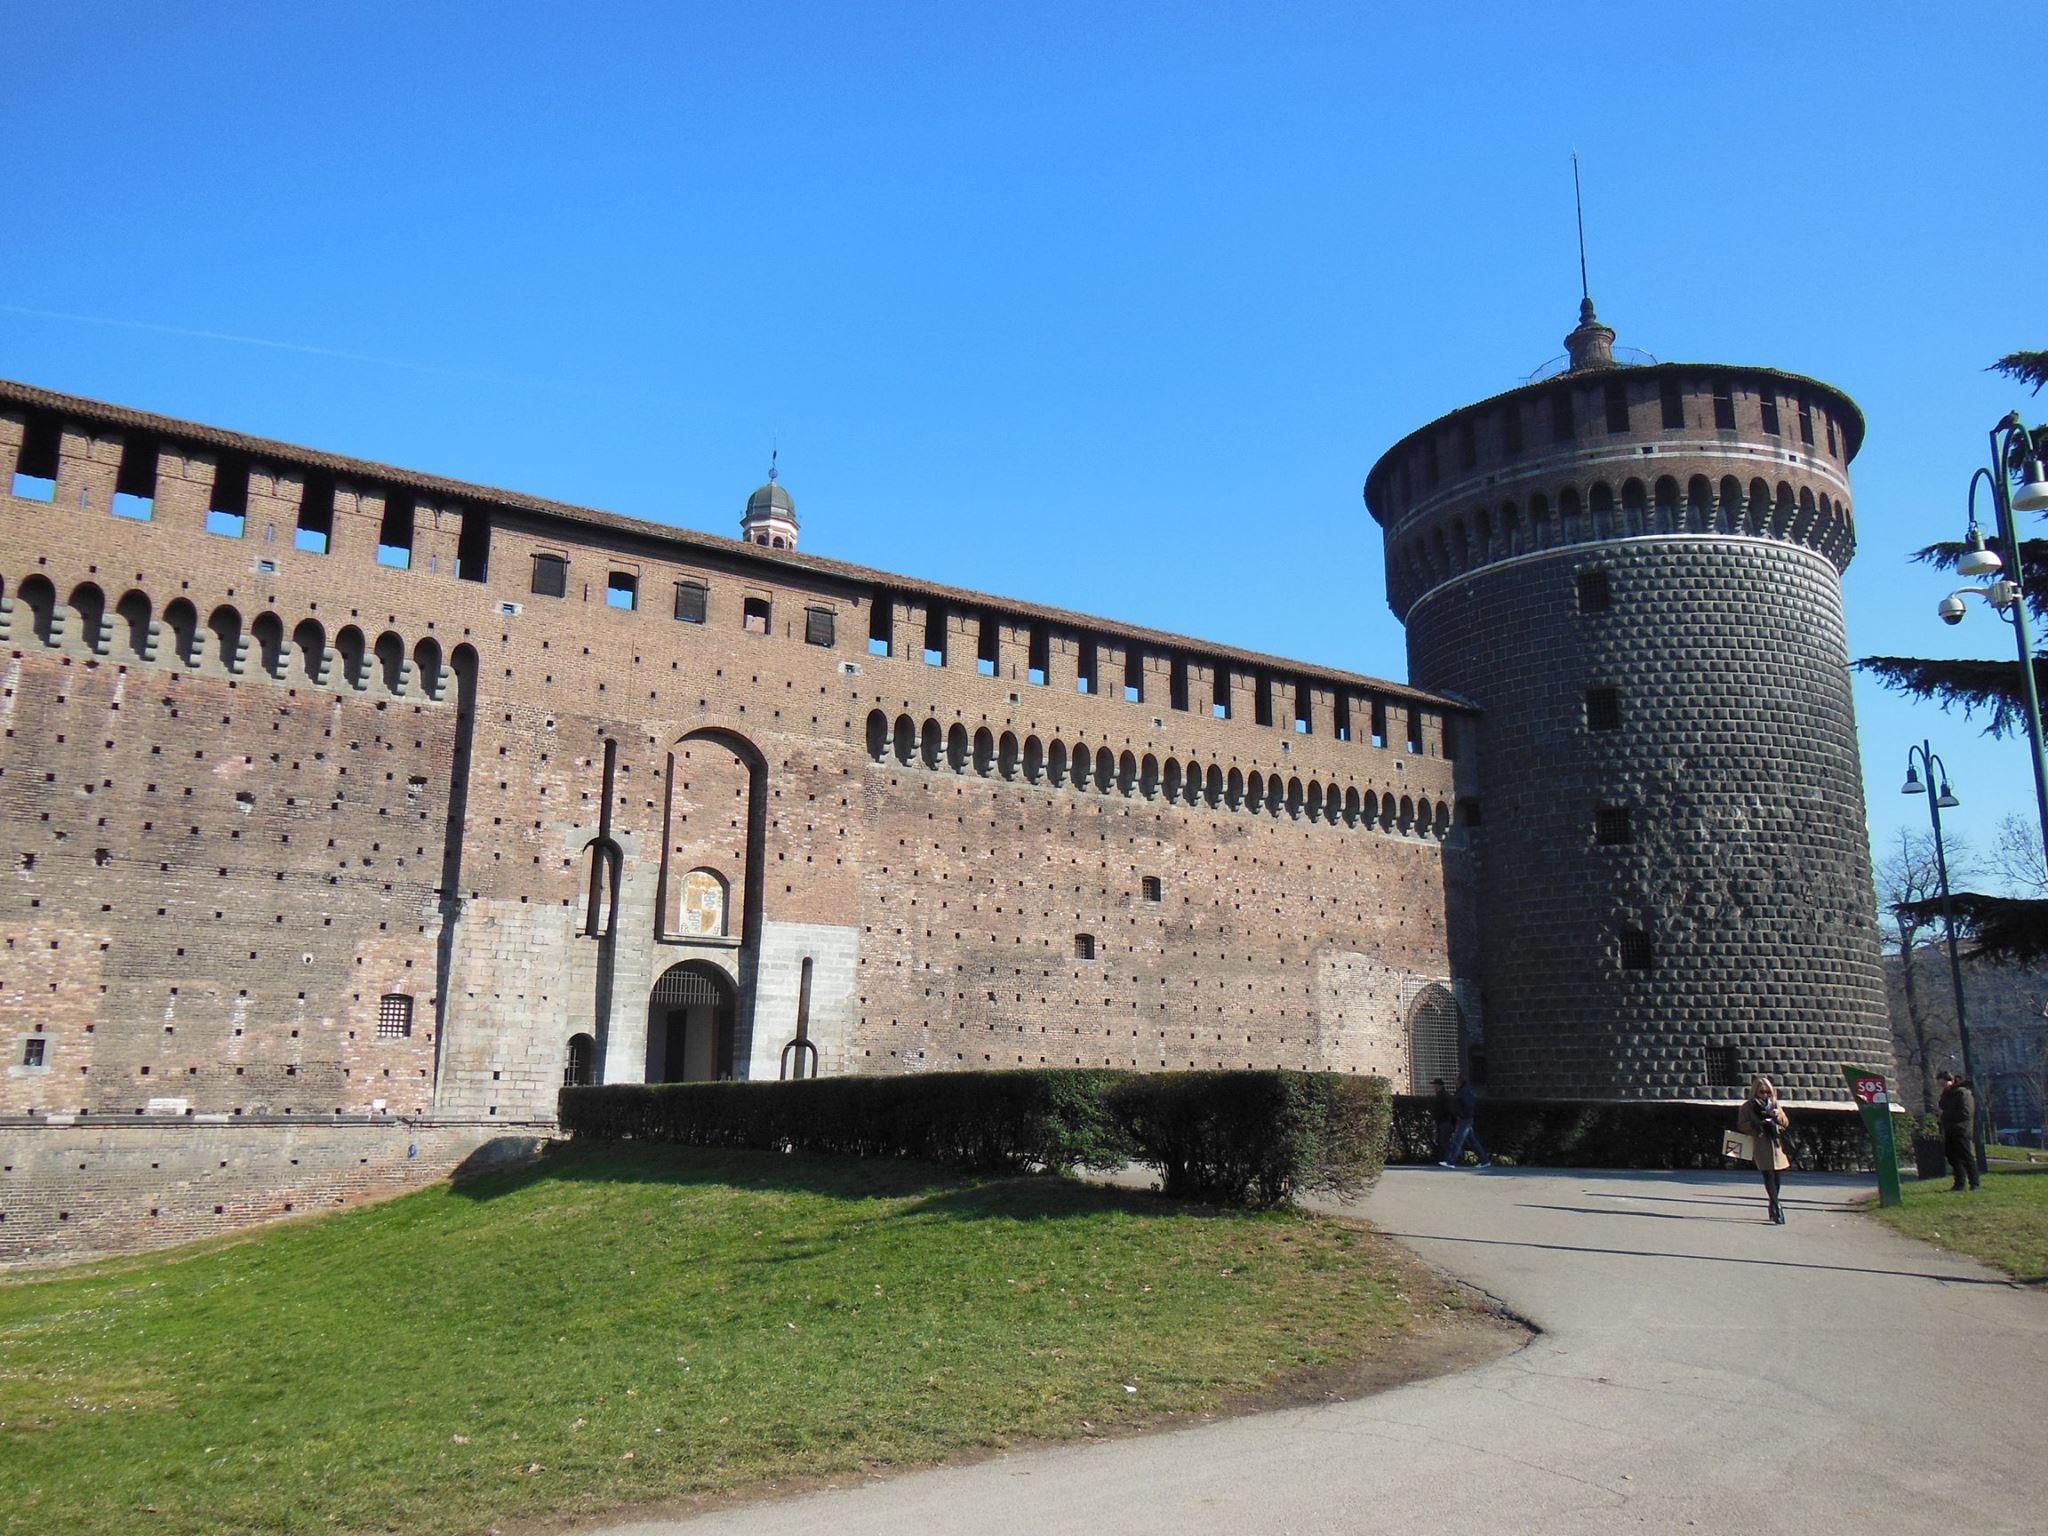 castello sforzesco tower